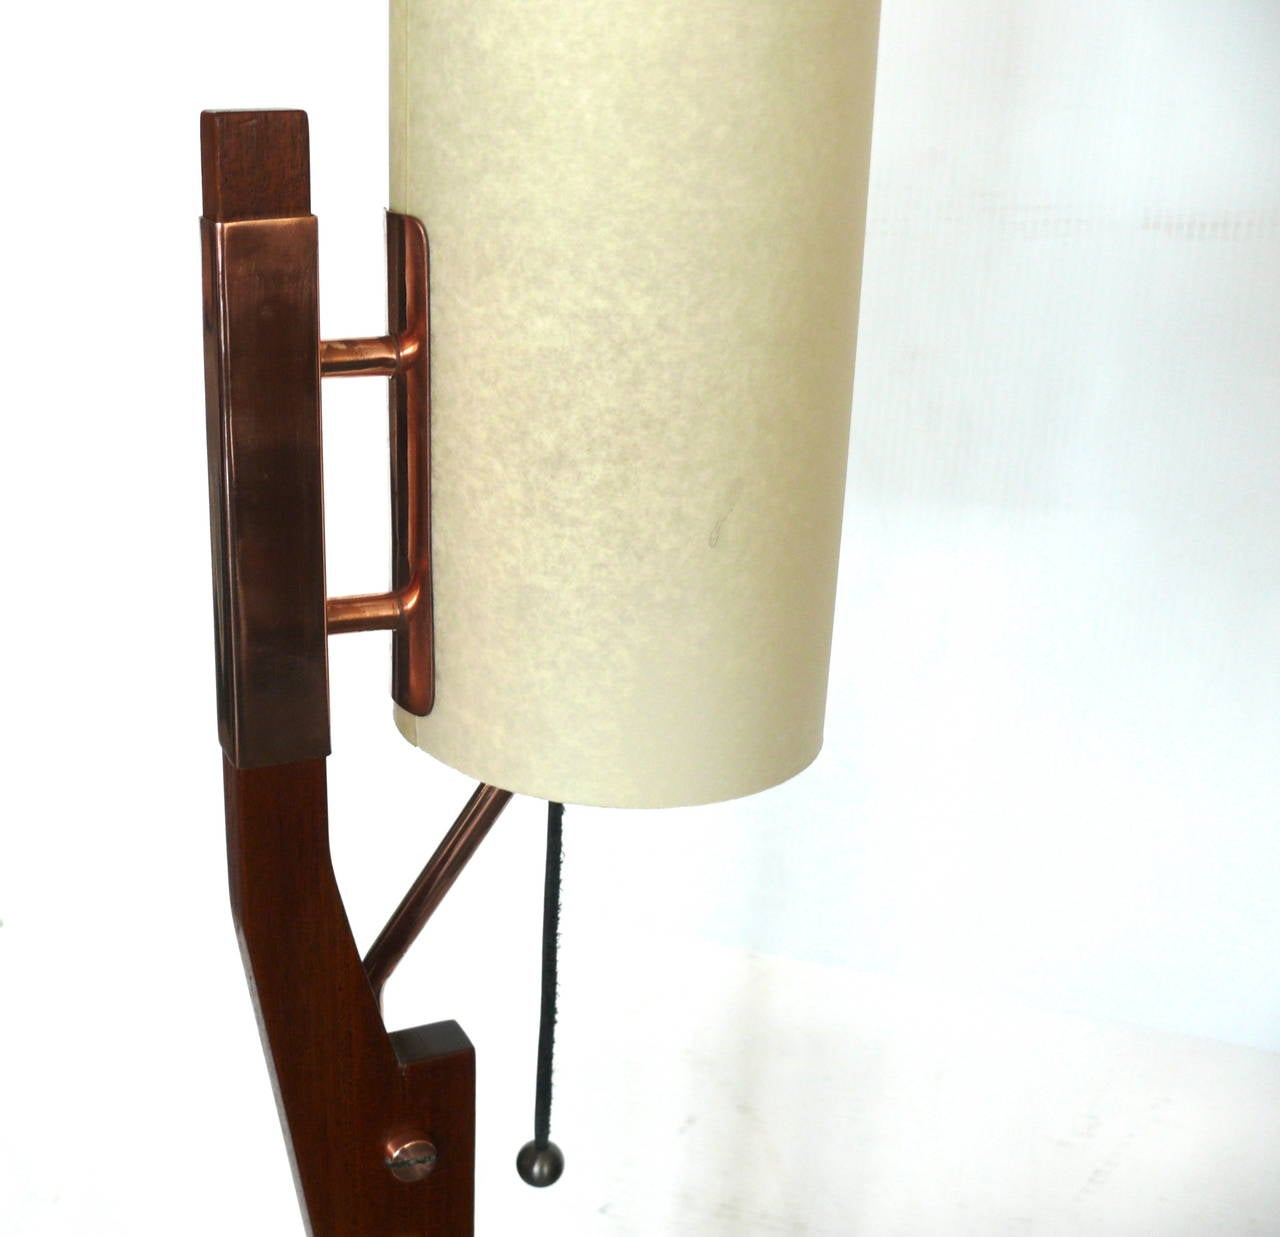 Floor Lamps Unique: Unique Floor Lamp By Orrefors At 1stdibs